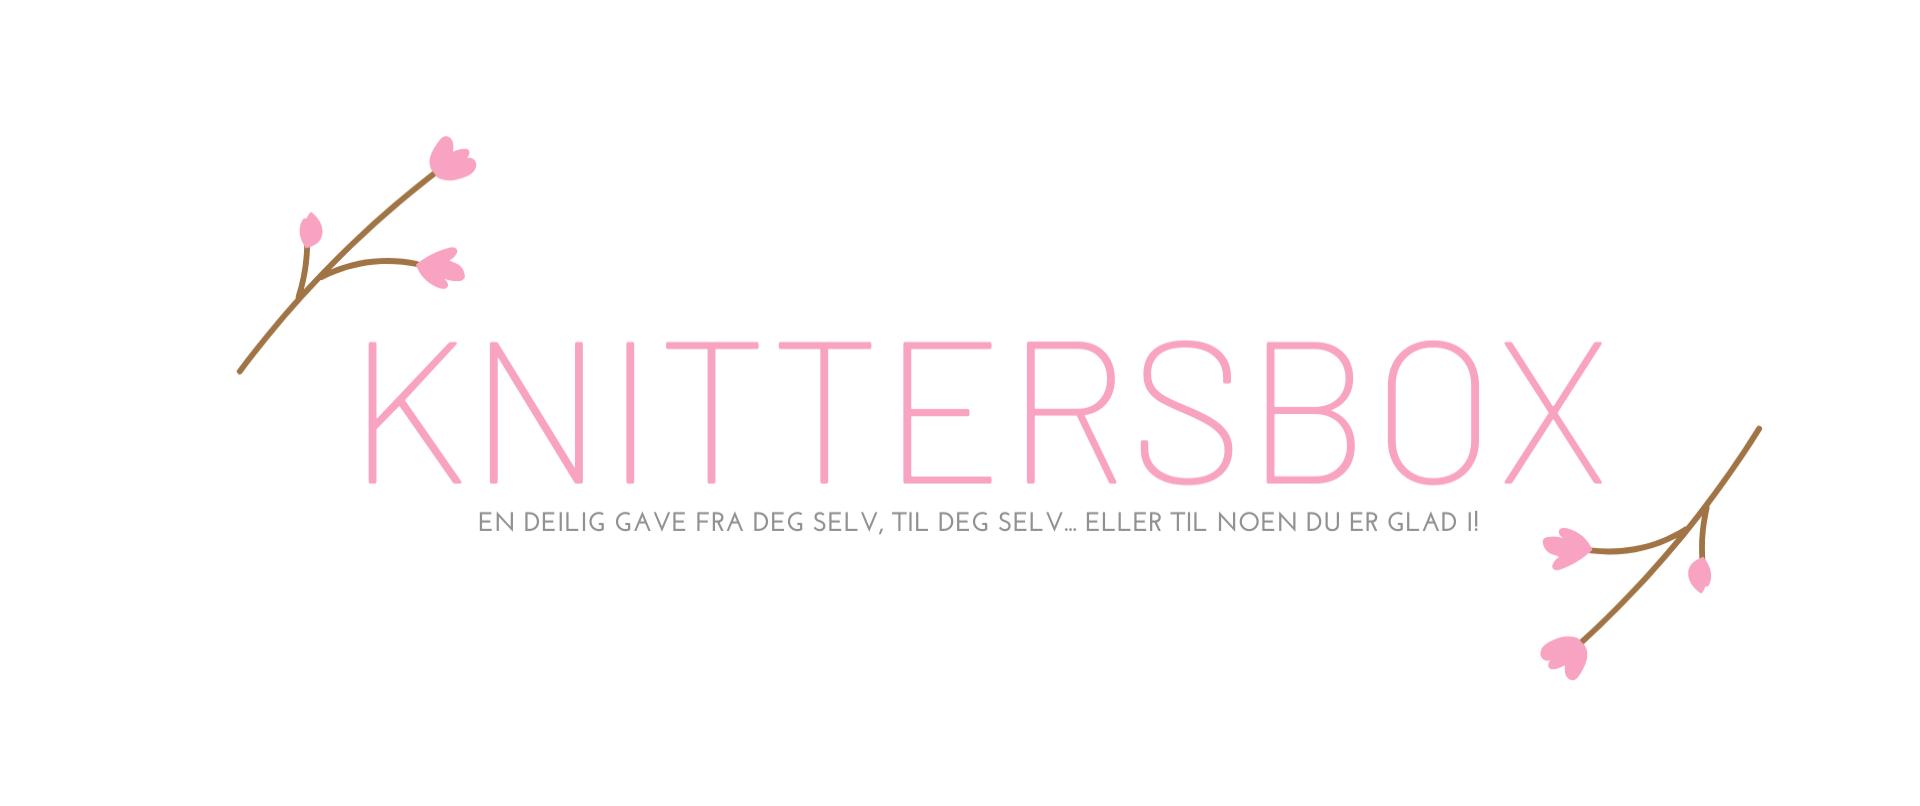 knittersbox.no